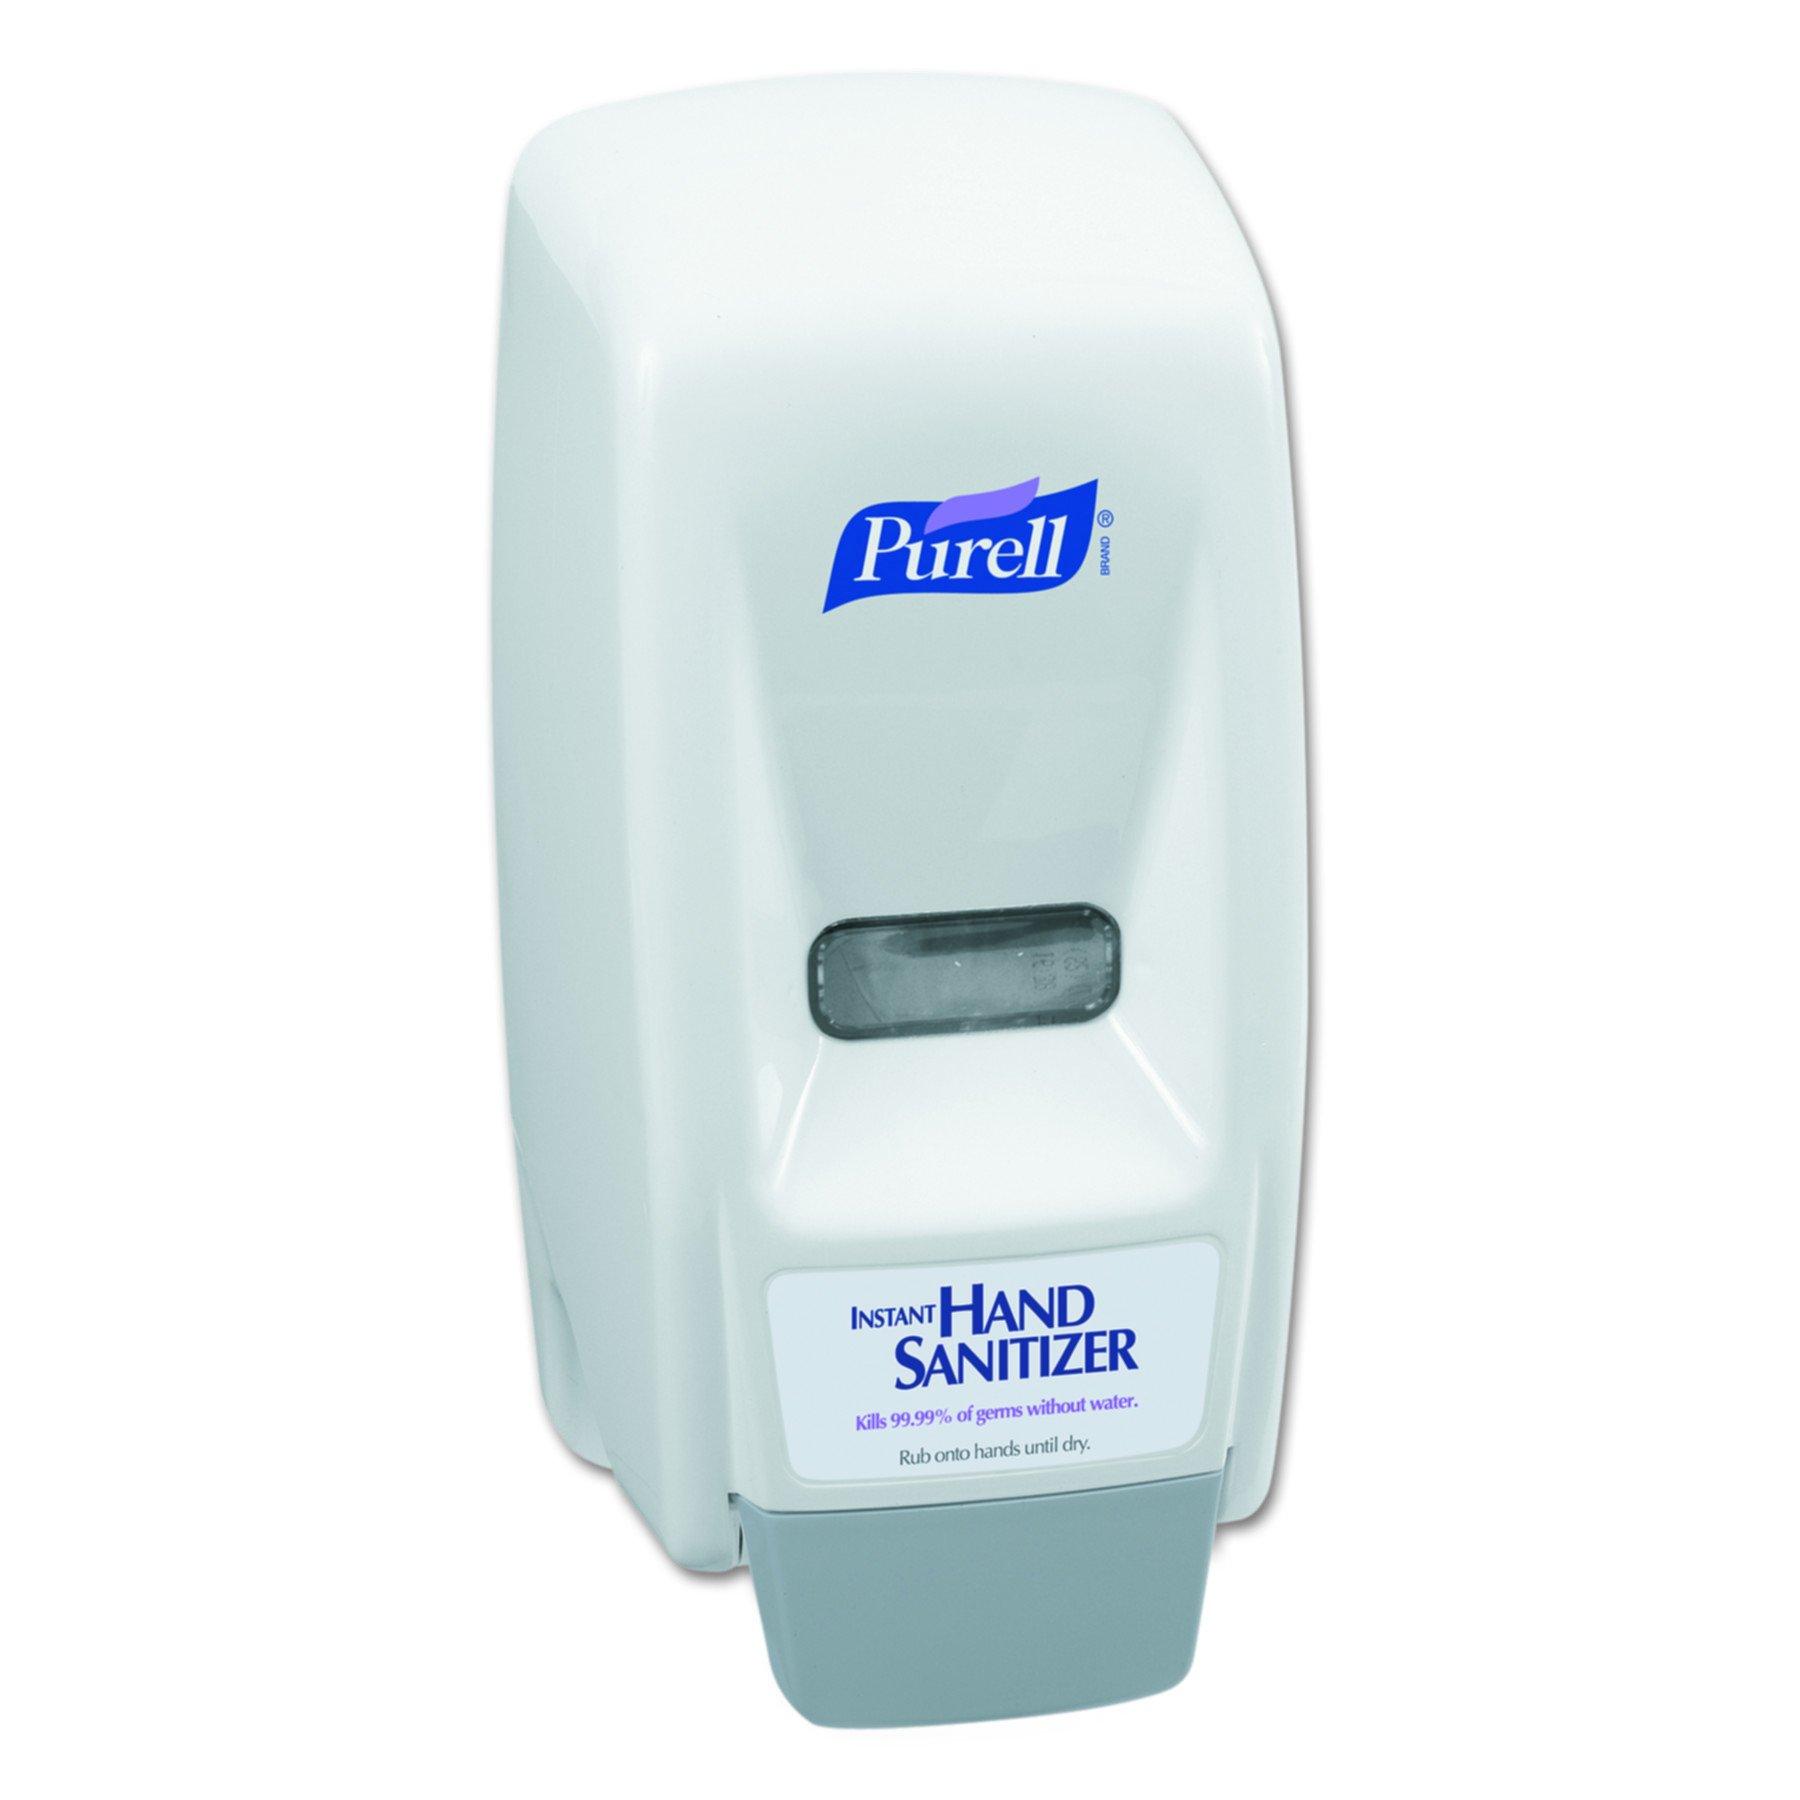 PURELL 962112 Bag-In-Box Hand Sanitizer Dispenser, 800mL, 5 5/8w x 5 1/8d x 11h, White